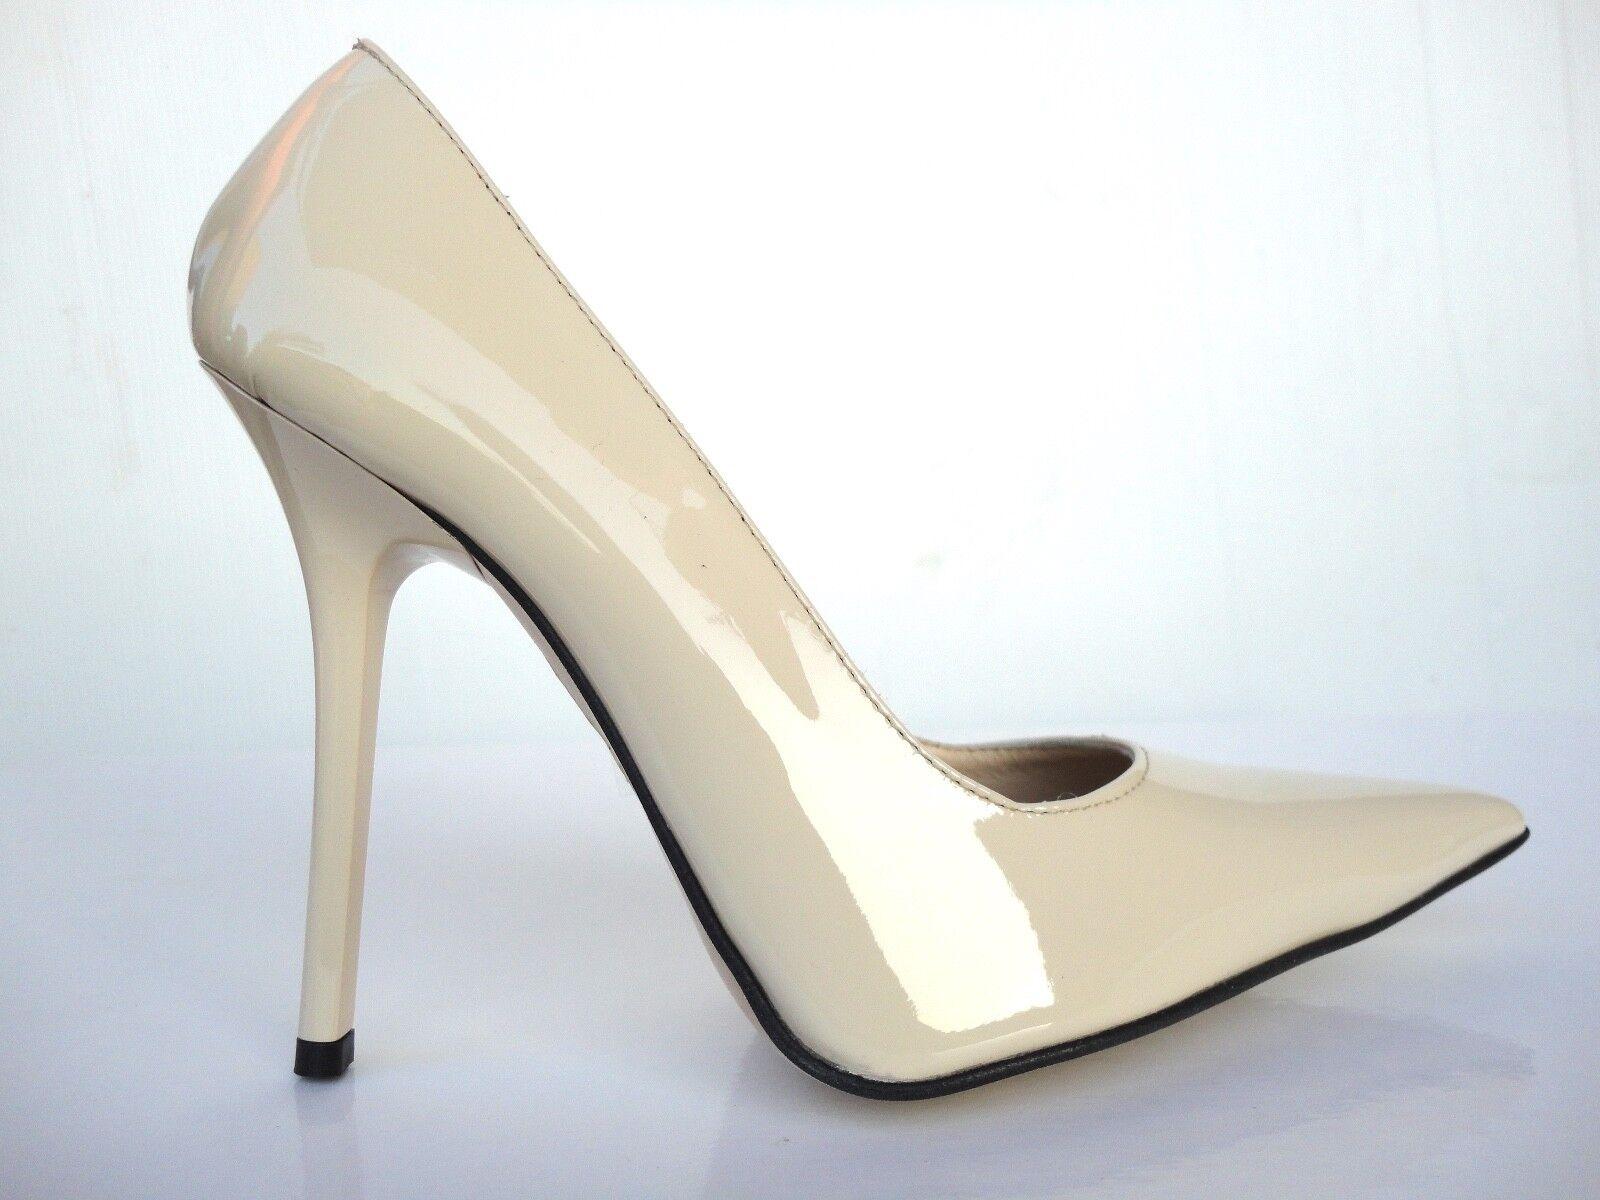 GIOHEL ITALY ITALY ITALY HIGH HEELS POINTY TOE PUMPS zapatos LEATHER DECOLTE NUDE BEIGE 40  de moda